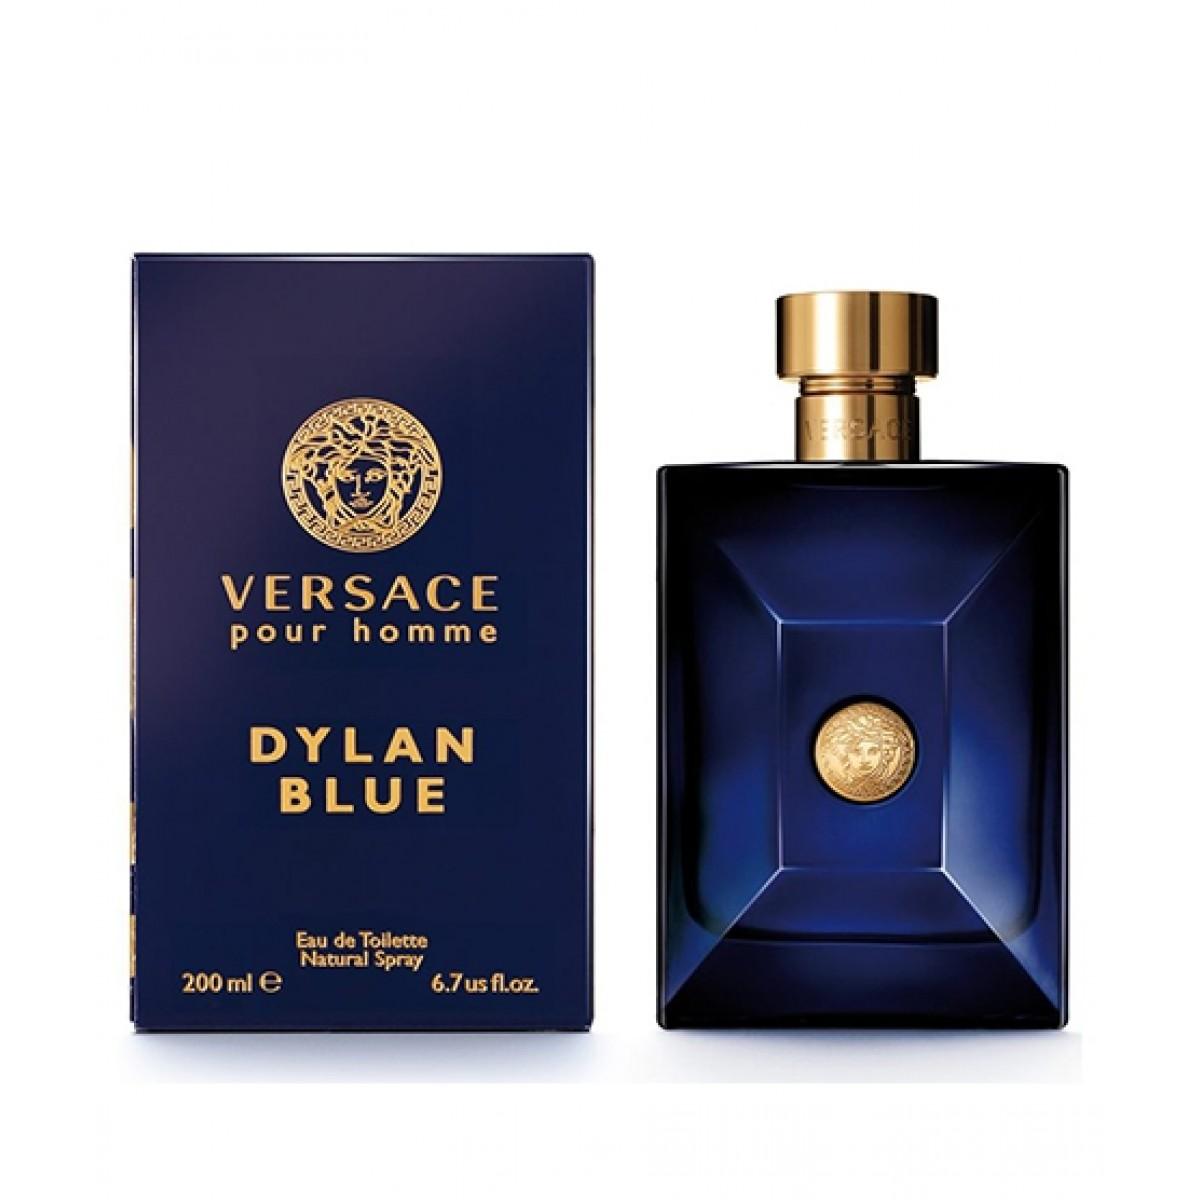 Versace Dylan Blue Edt Perfume For Men Price In Pakistan Buy